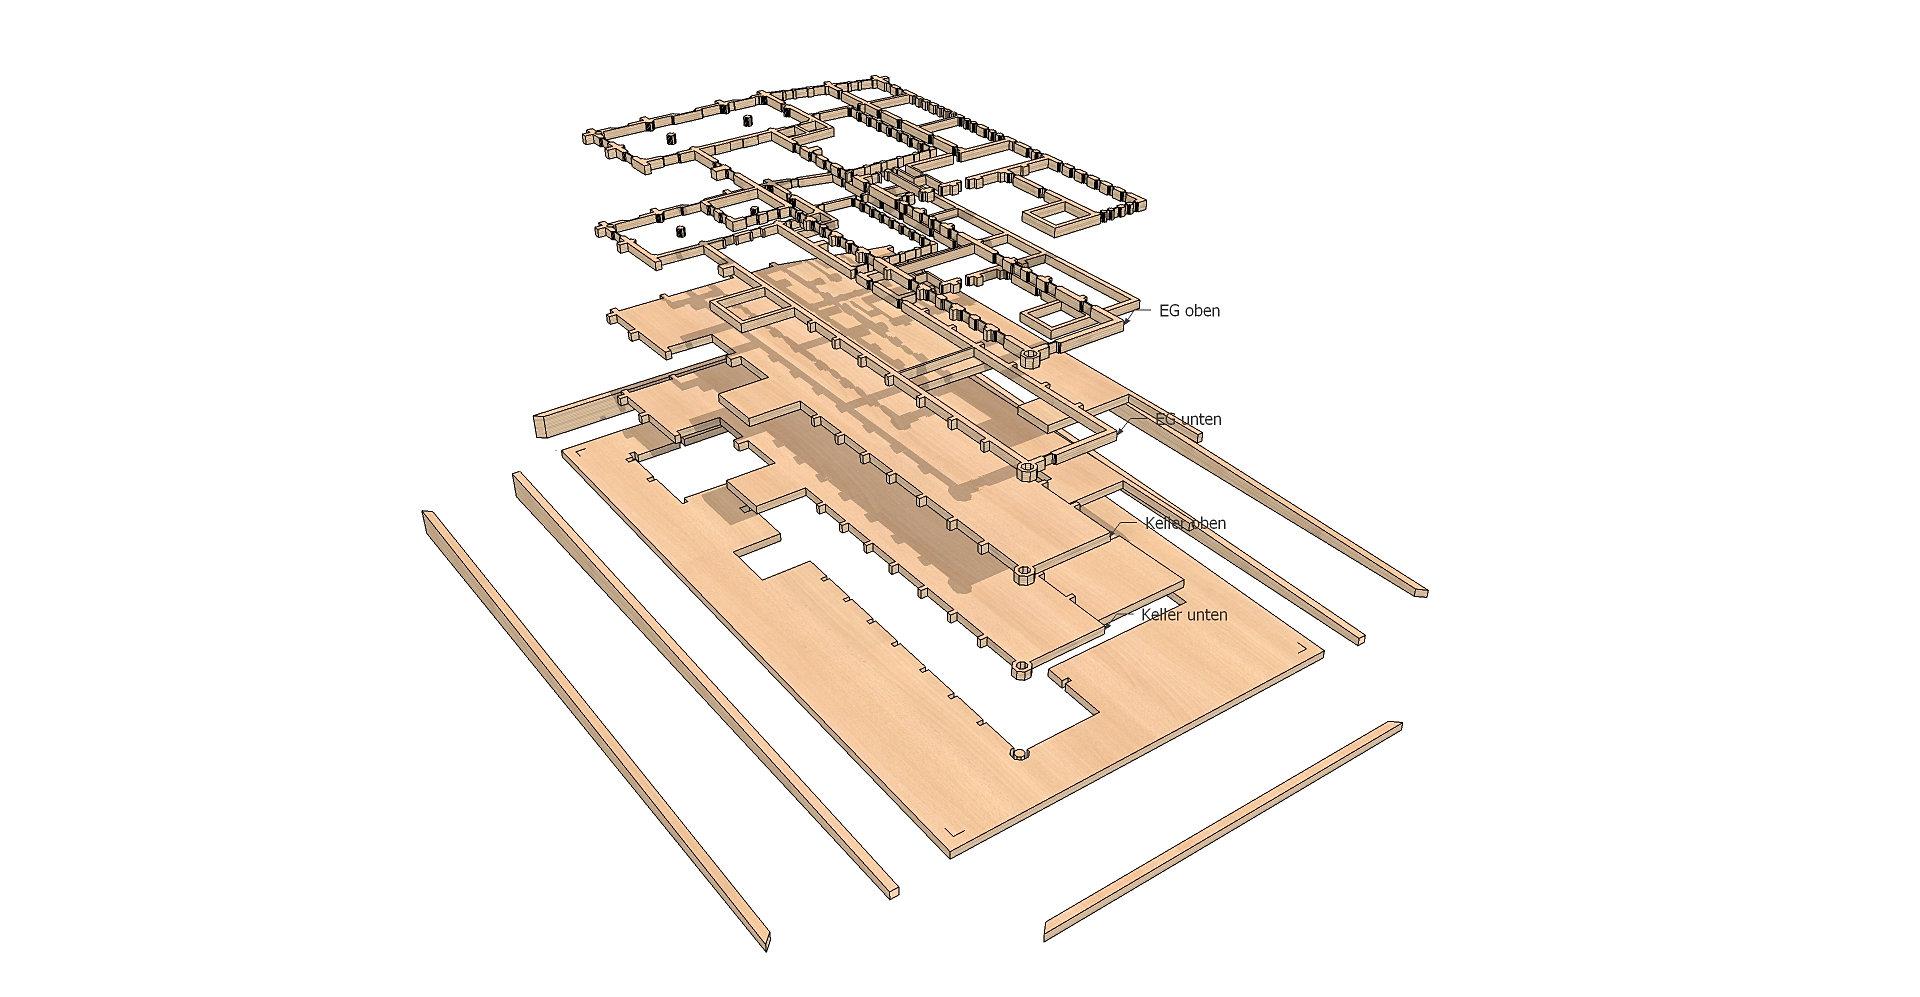 innenarchitektur, innenarchitekt | architekturmodell hospital lÜbeck, Innenarchitektur ideen